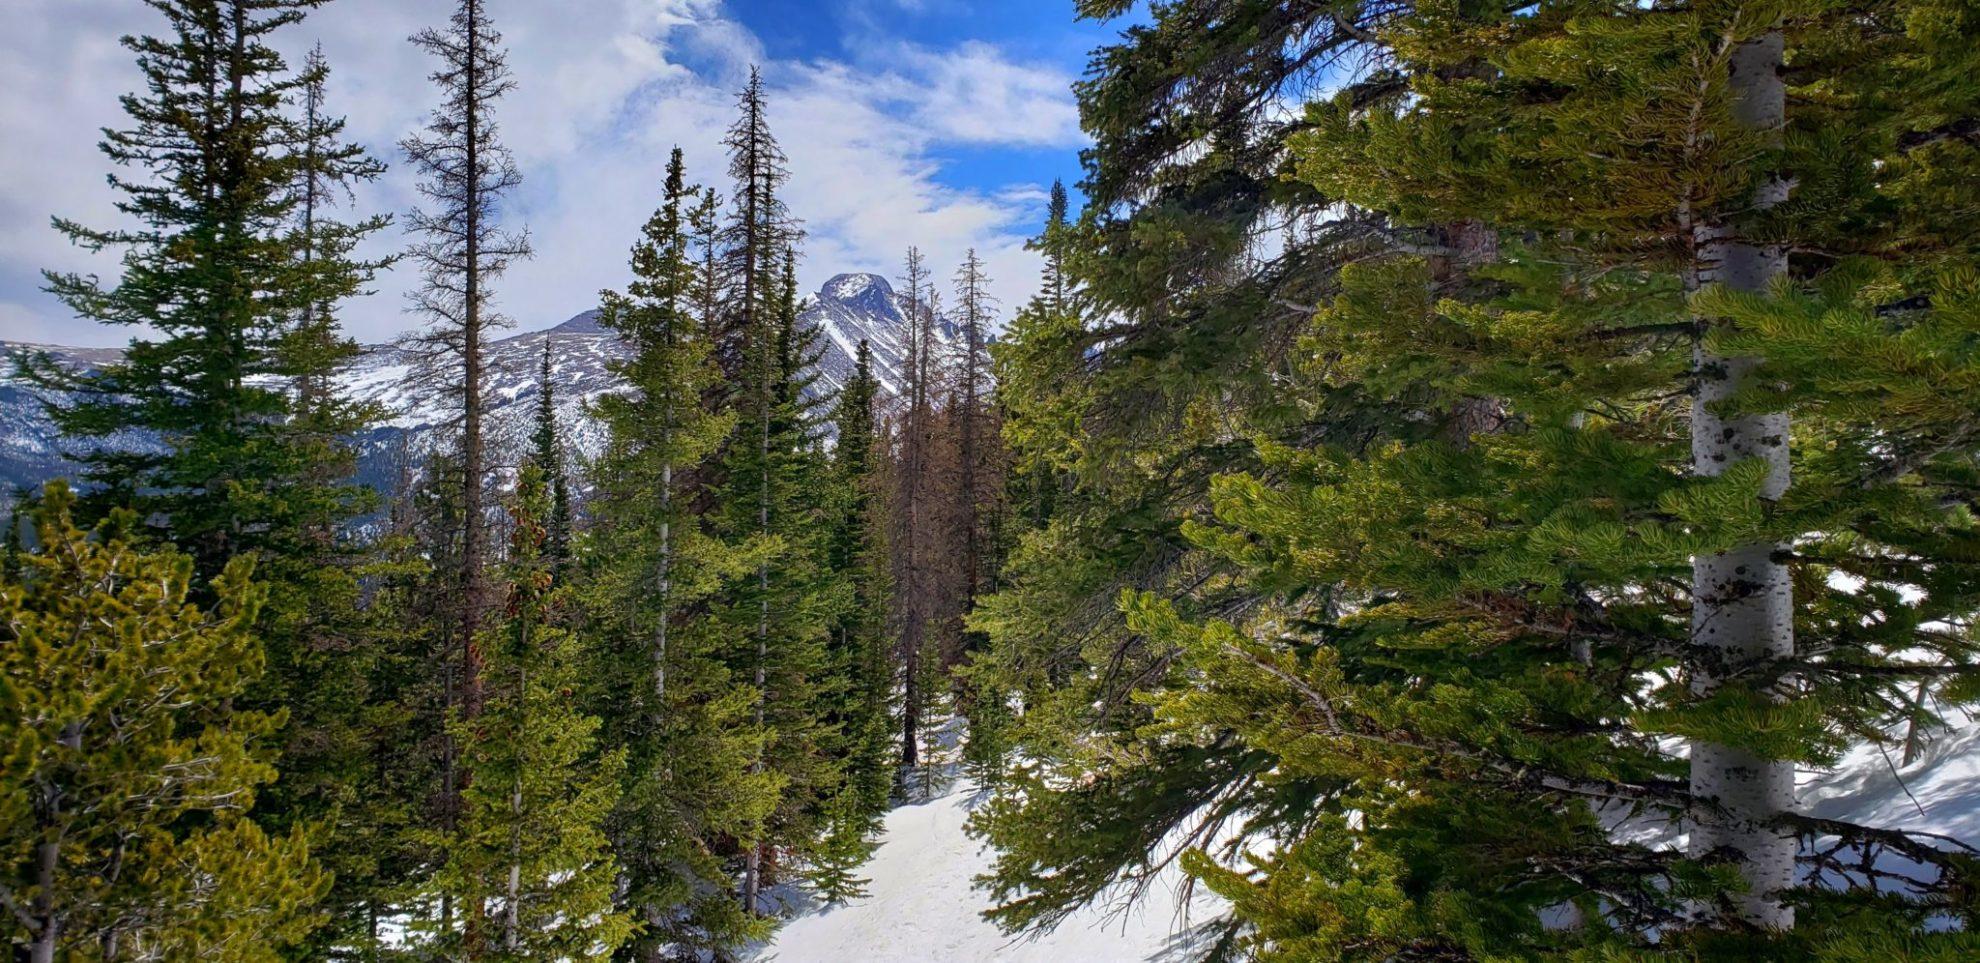 View of Longs Peak along the trail